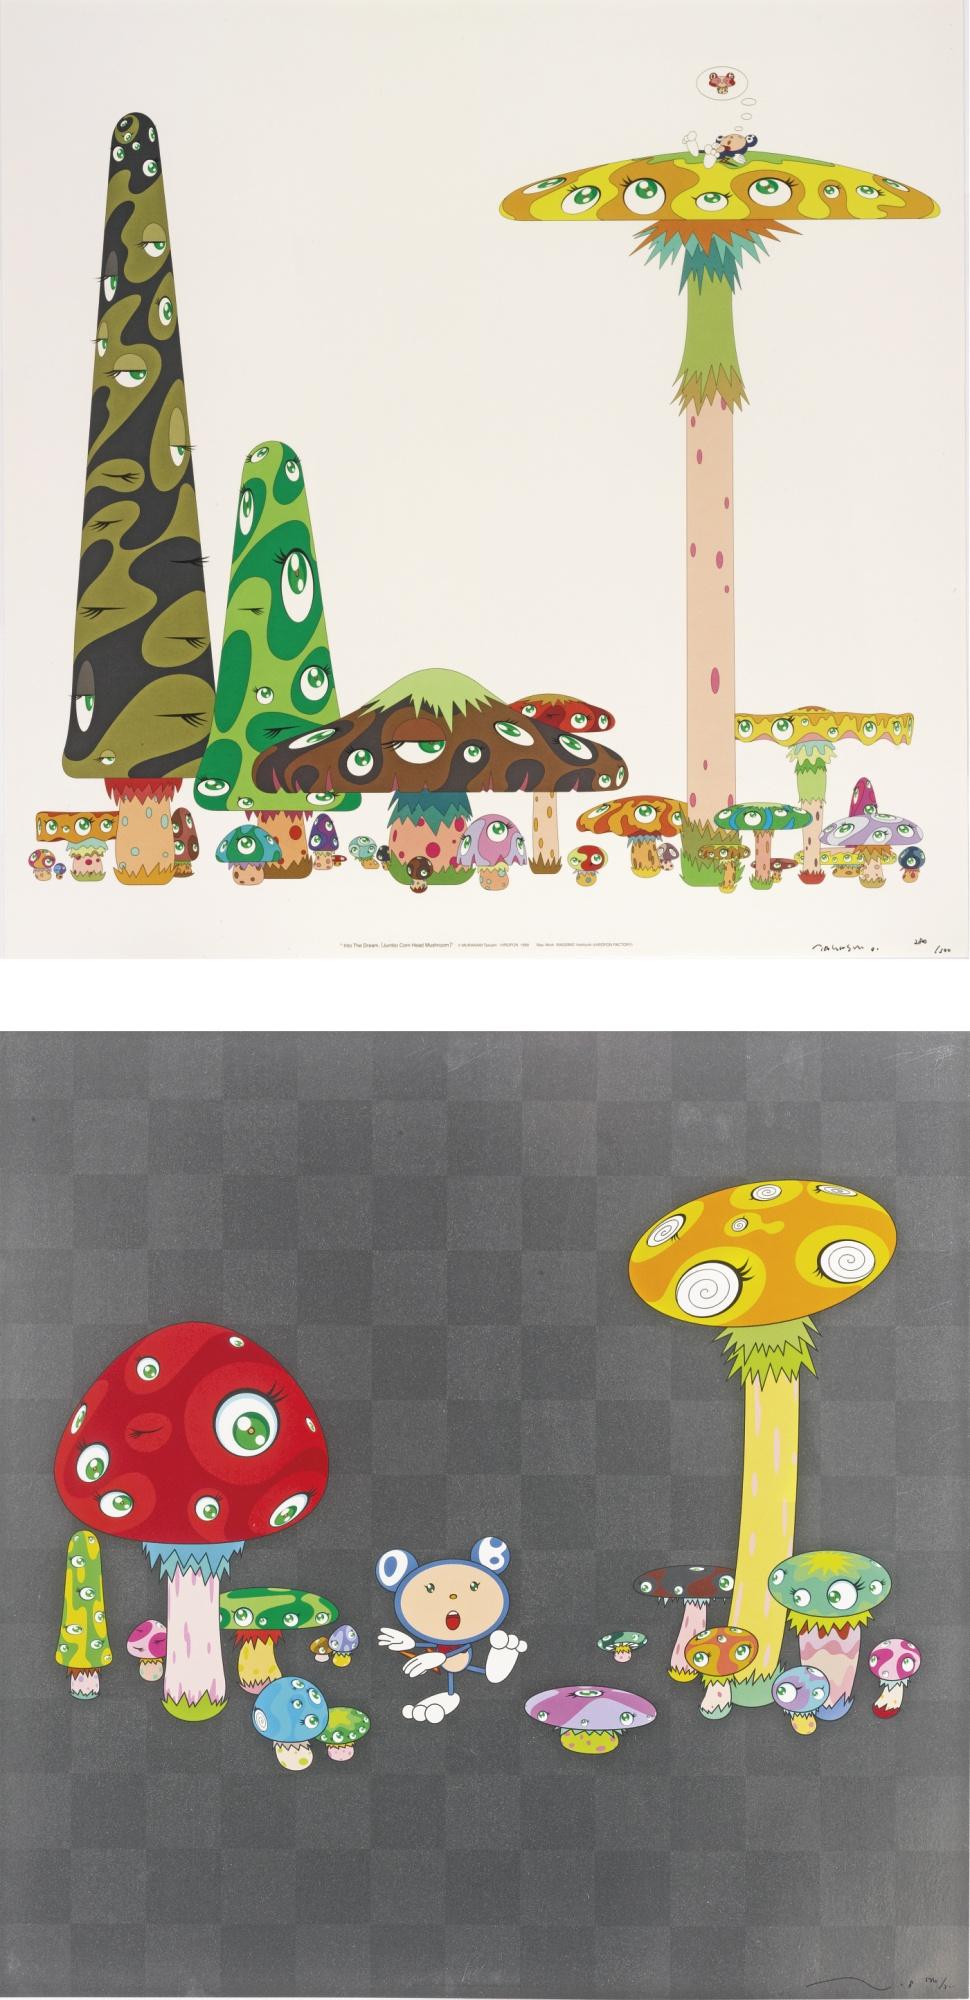 Takashi Murakami-Into The Dream Jumbo Corn Head Mushroom And Guru Guru: 2 Prints-2001